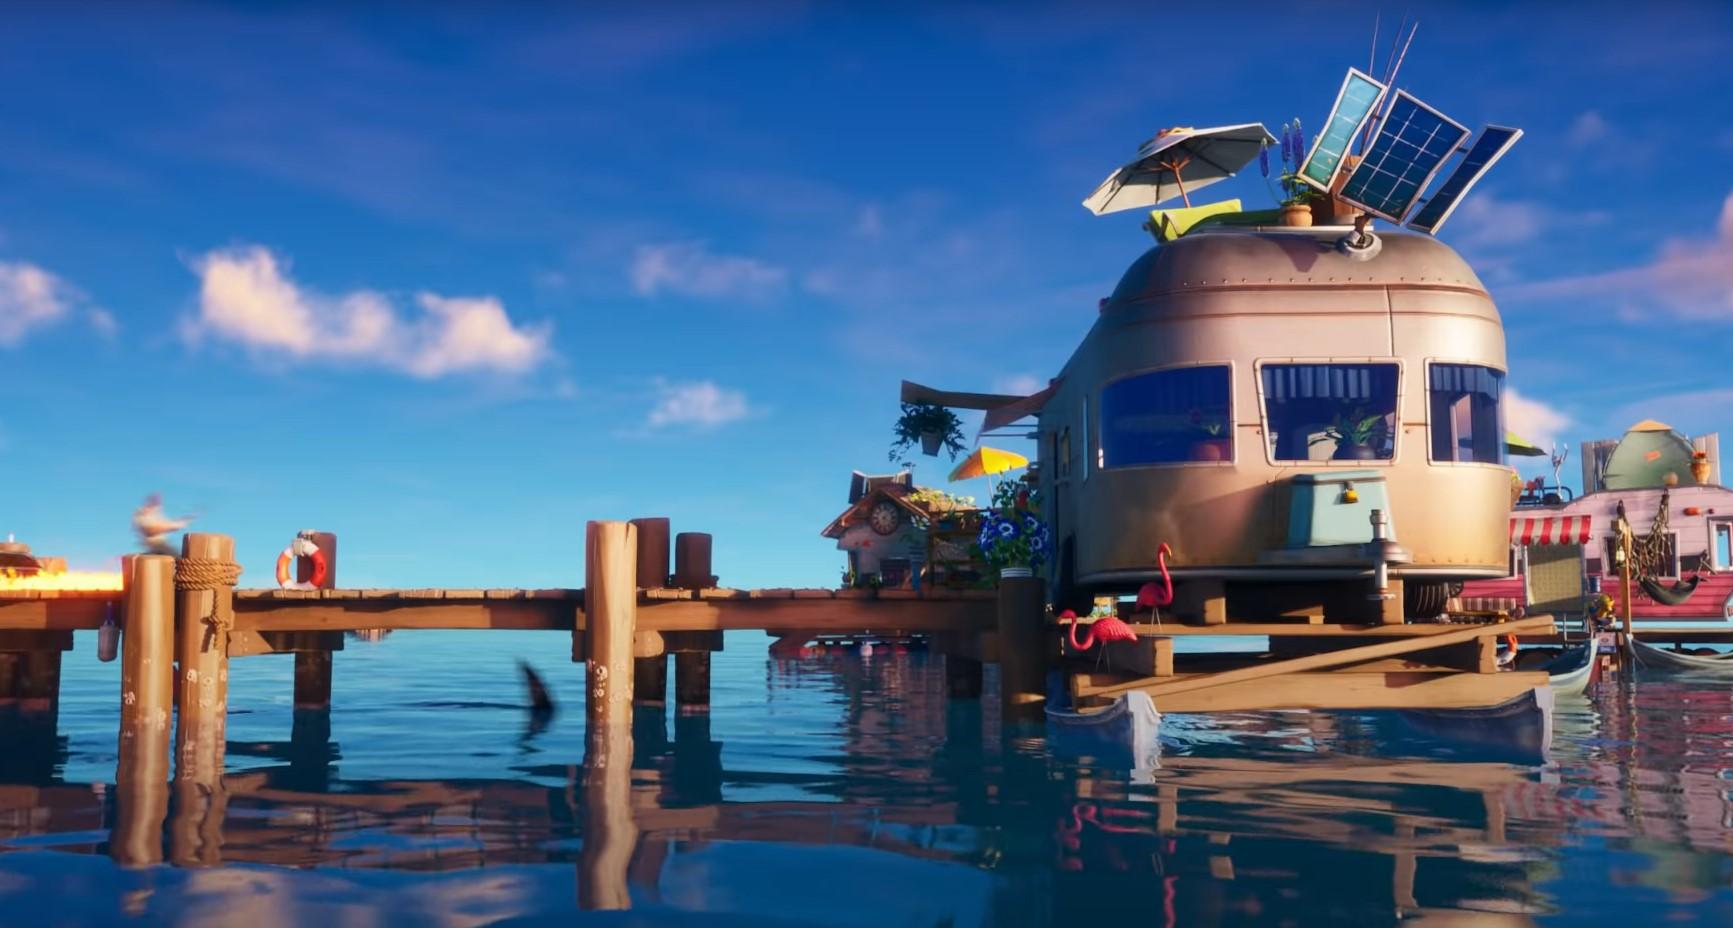 Fortnite Chapter 2 Season 3 Rickety Rig location. Image courtesy of Dot Esports.